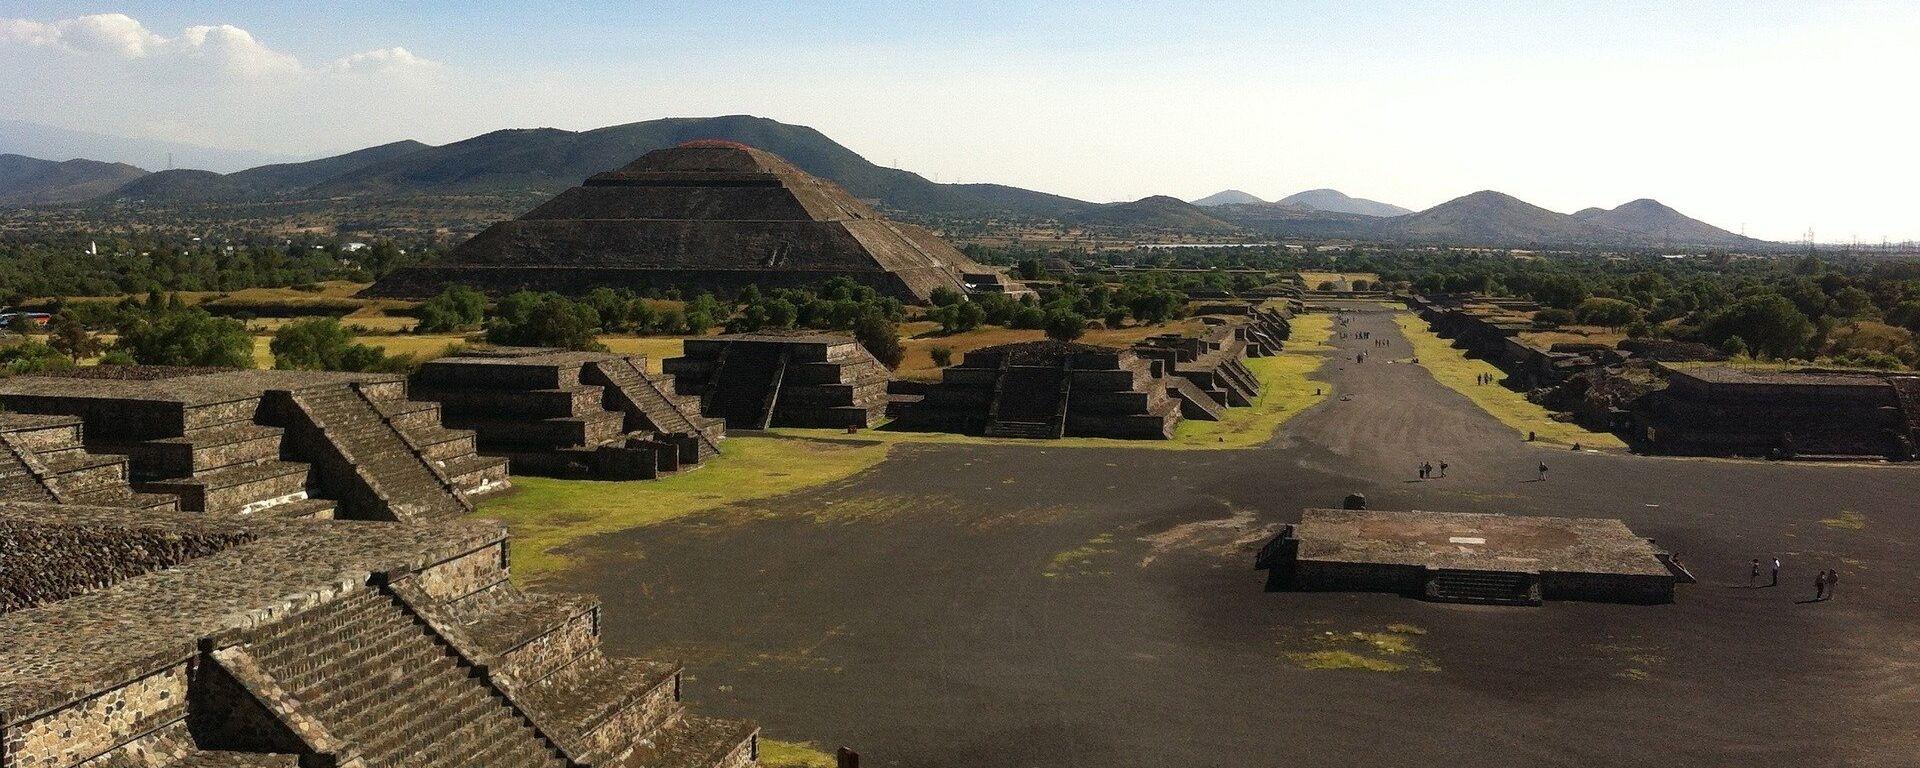 Teotihuacán - Sputnik Mundo, 1920, 23.09.2018